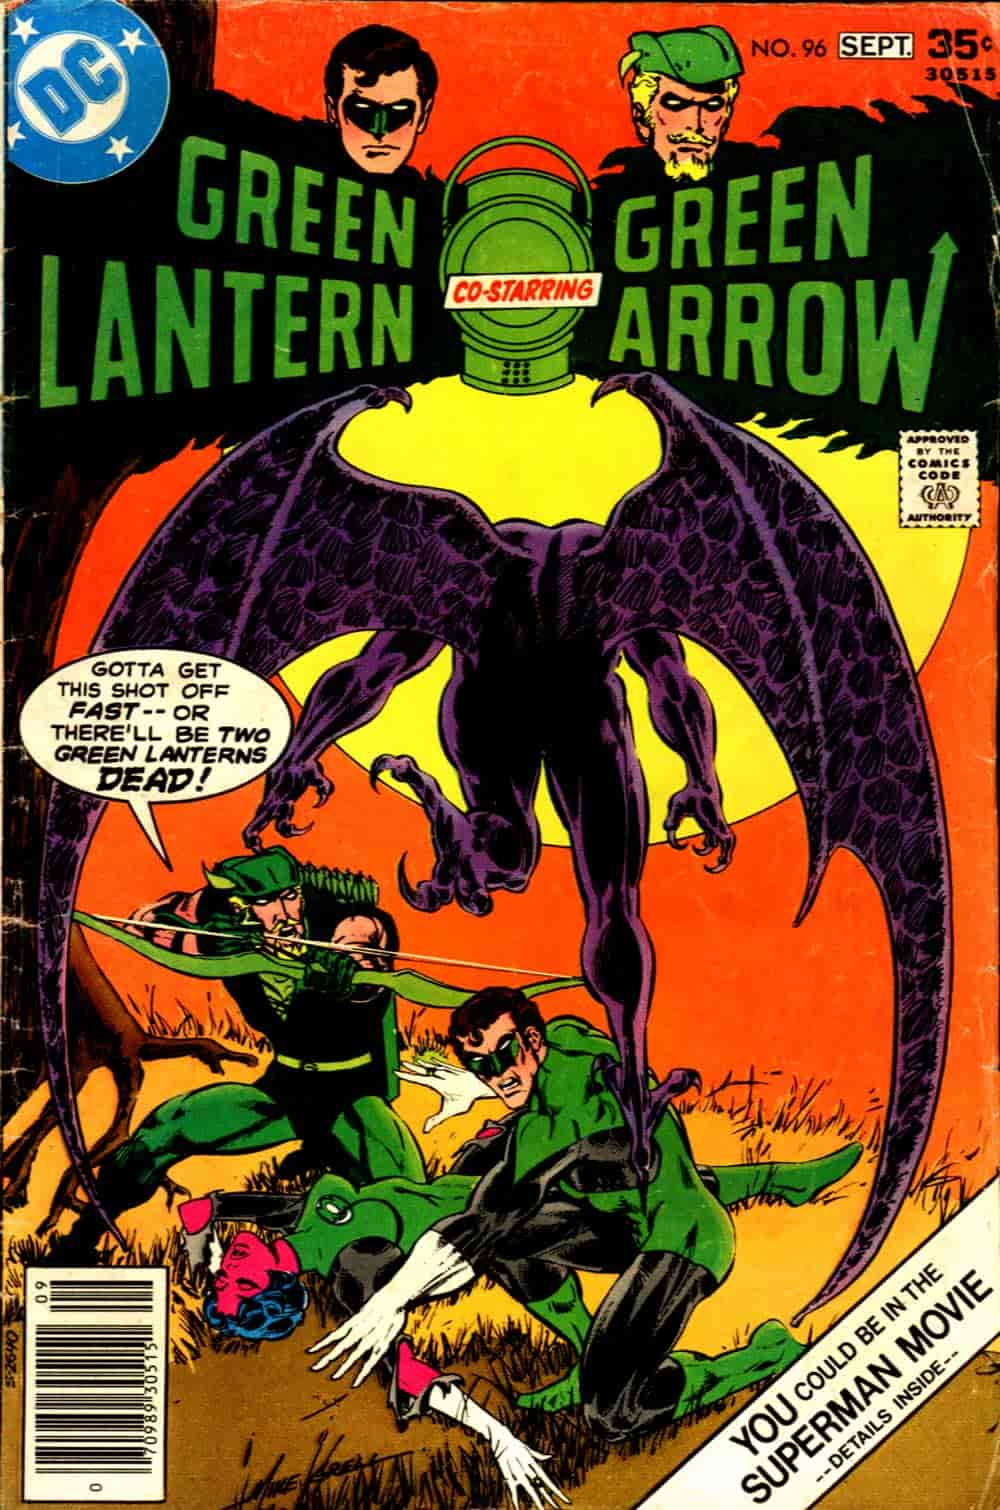 Green Lantern/Green Arrow #96, portada de Mike Grell y Tatjana Wood